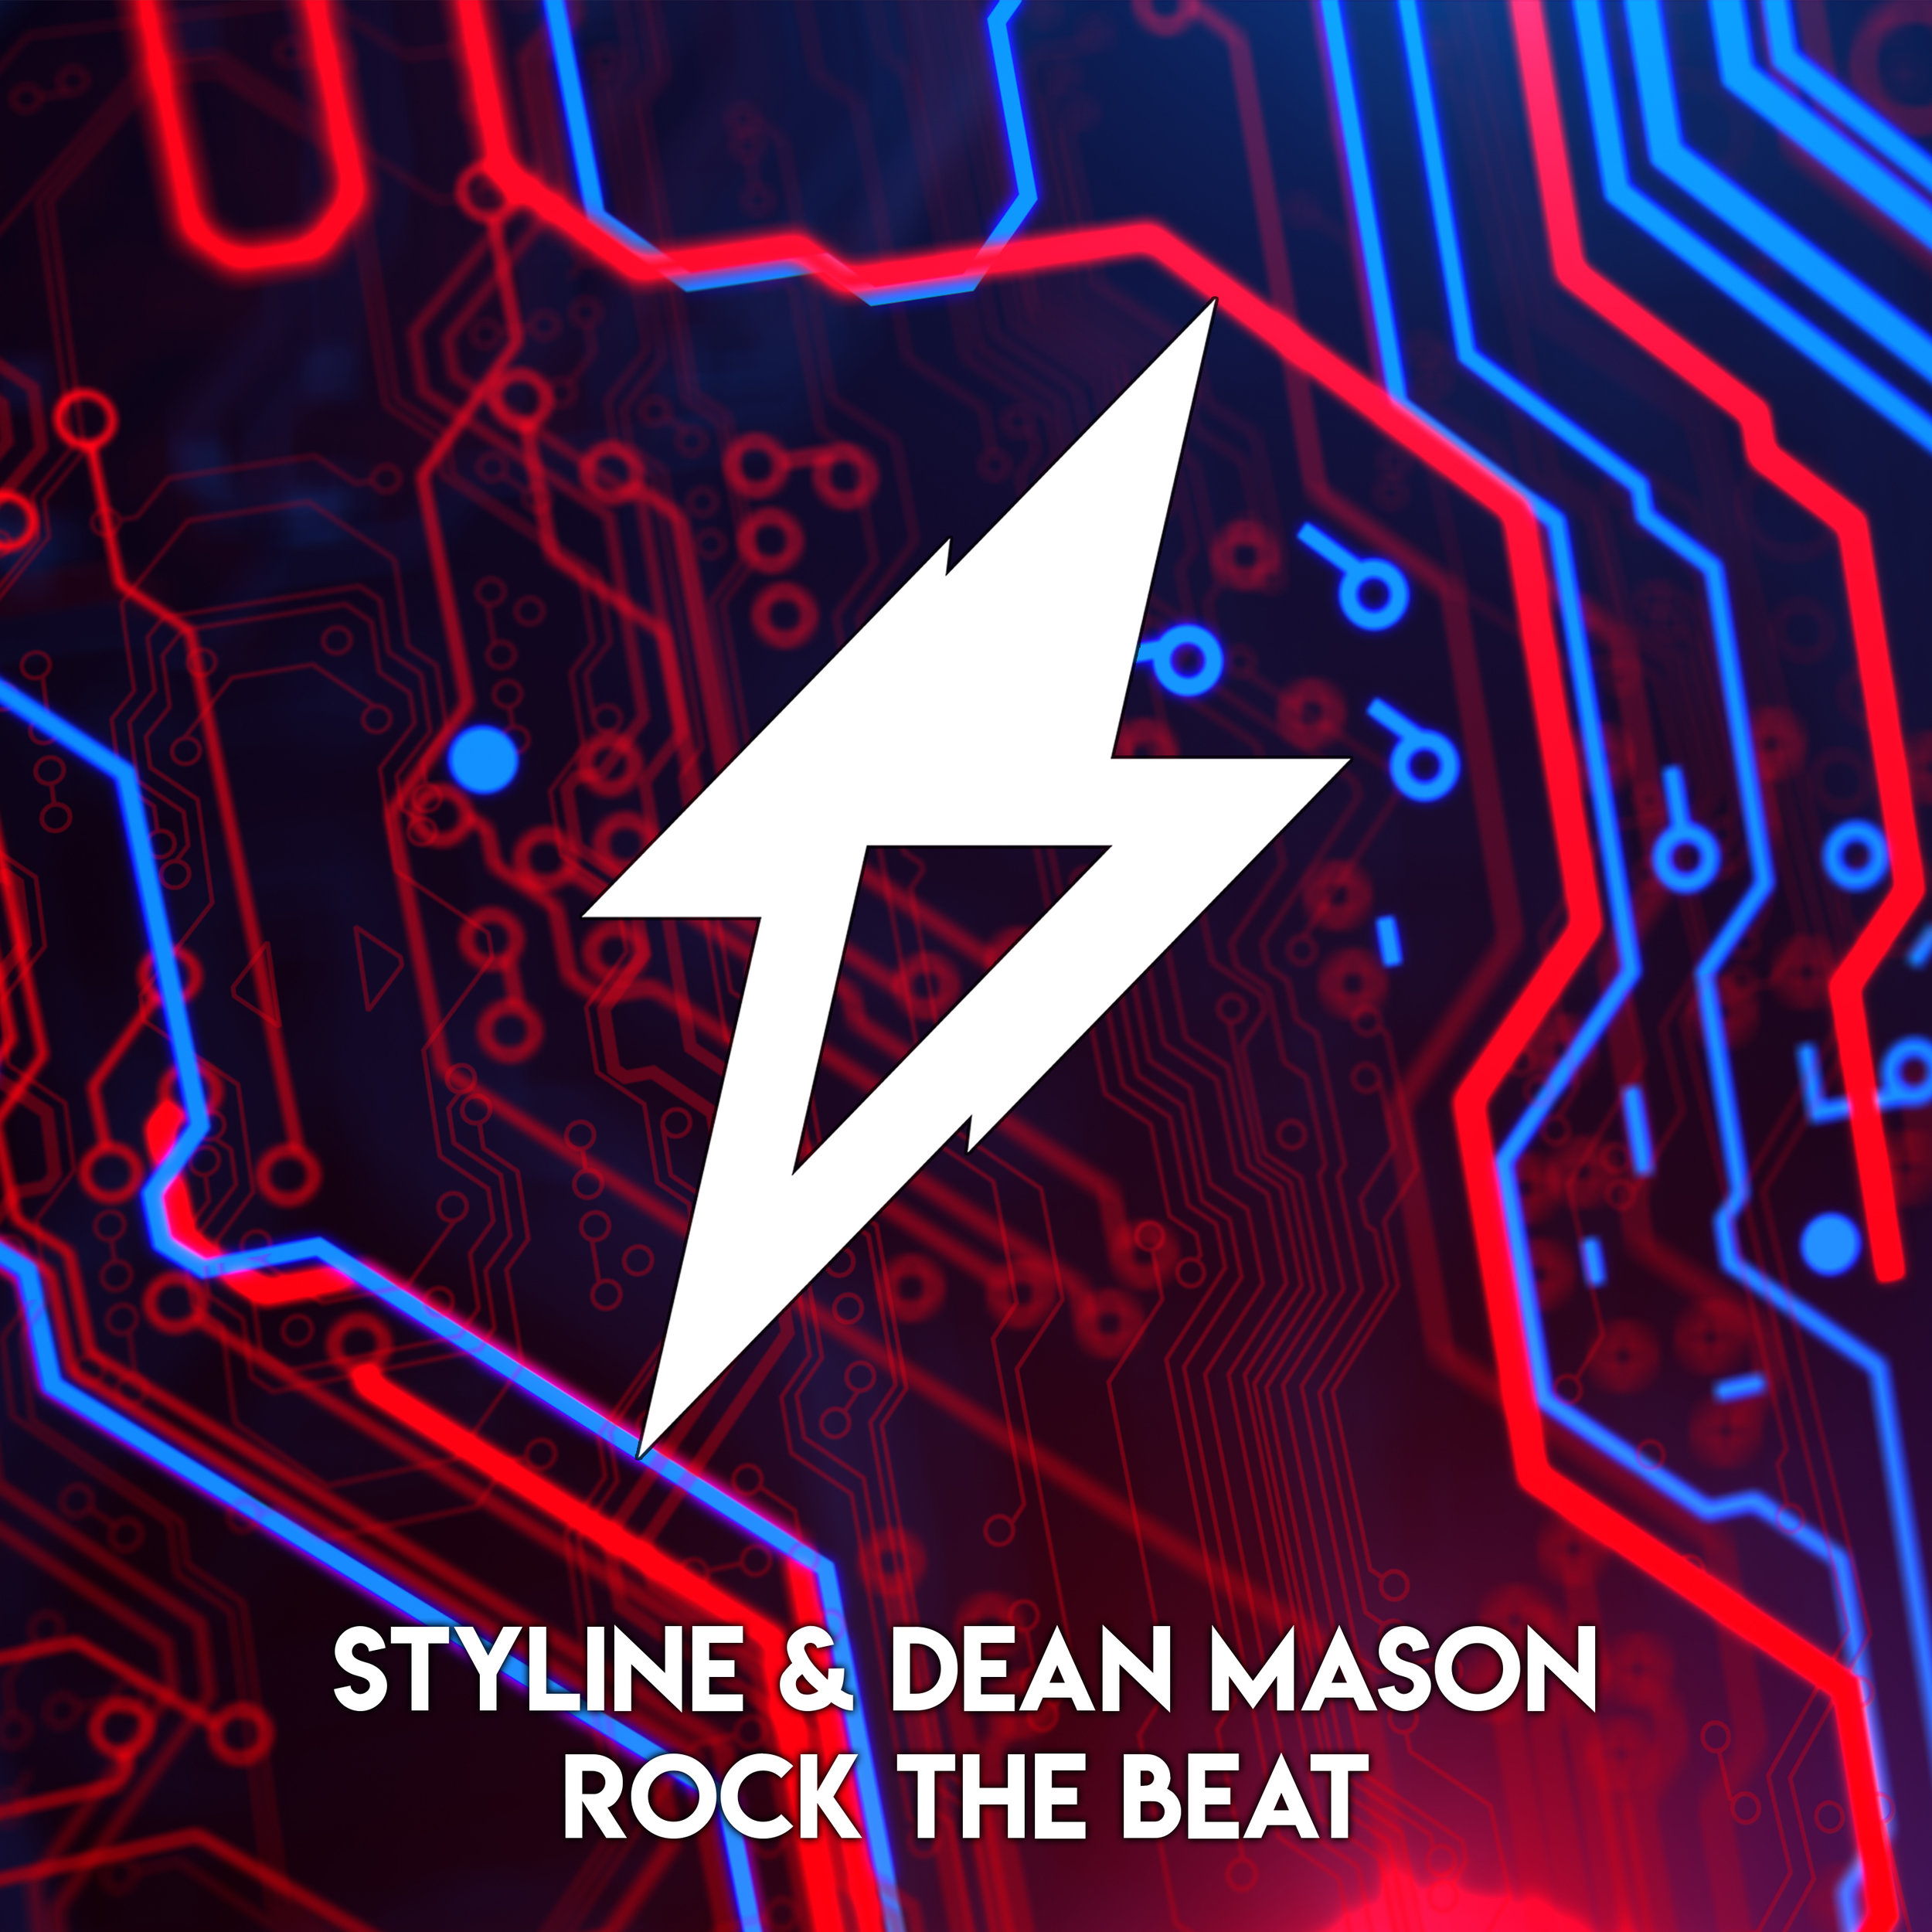 Styline & Dean Mason - Rock The Beat